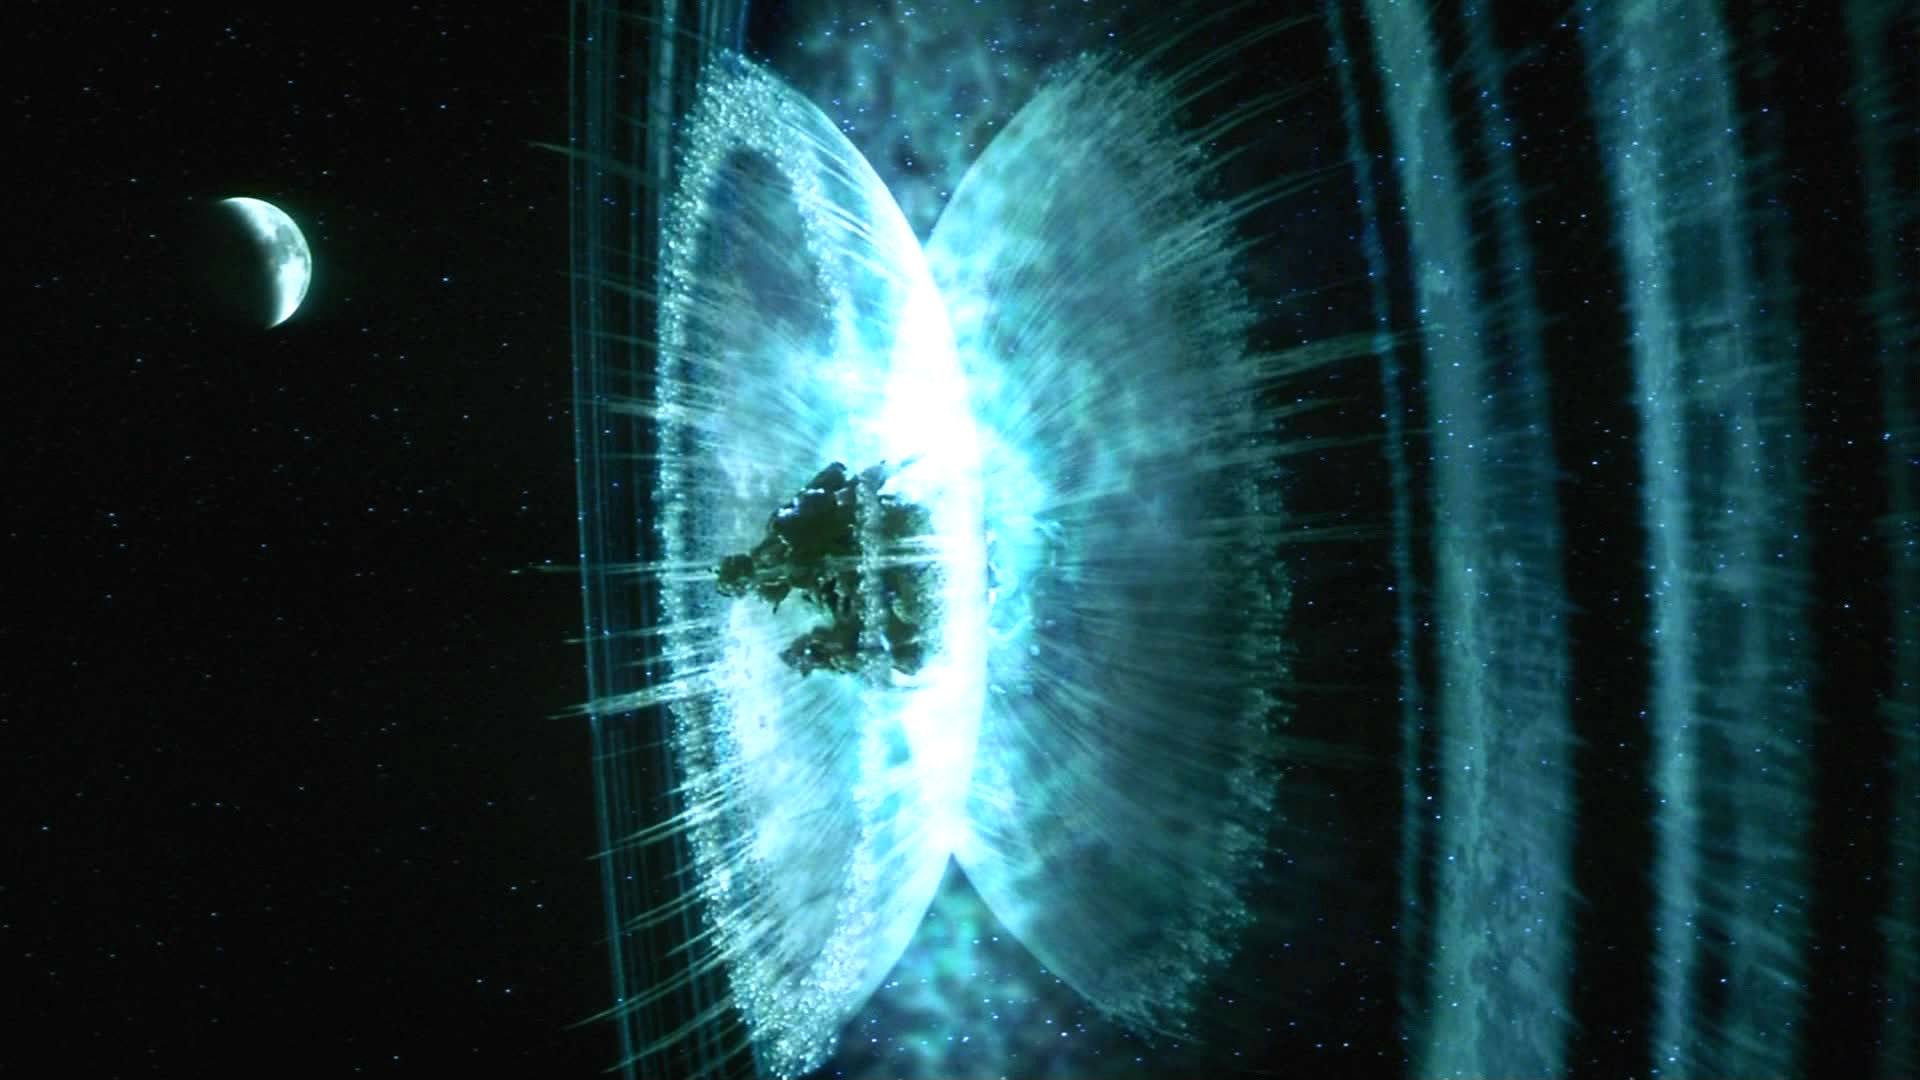 ARMAGEDDON action adventure sci-fi space stars apocalyptic ...